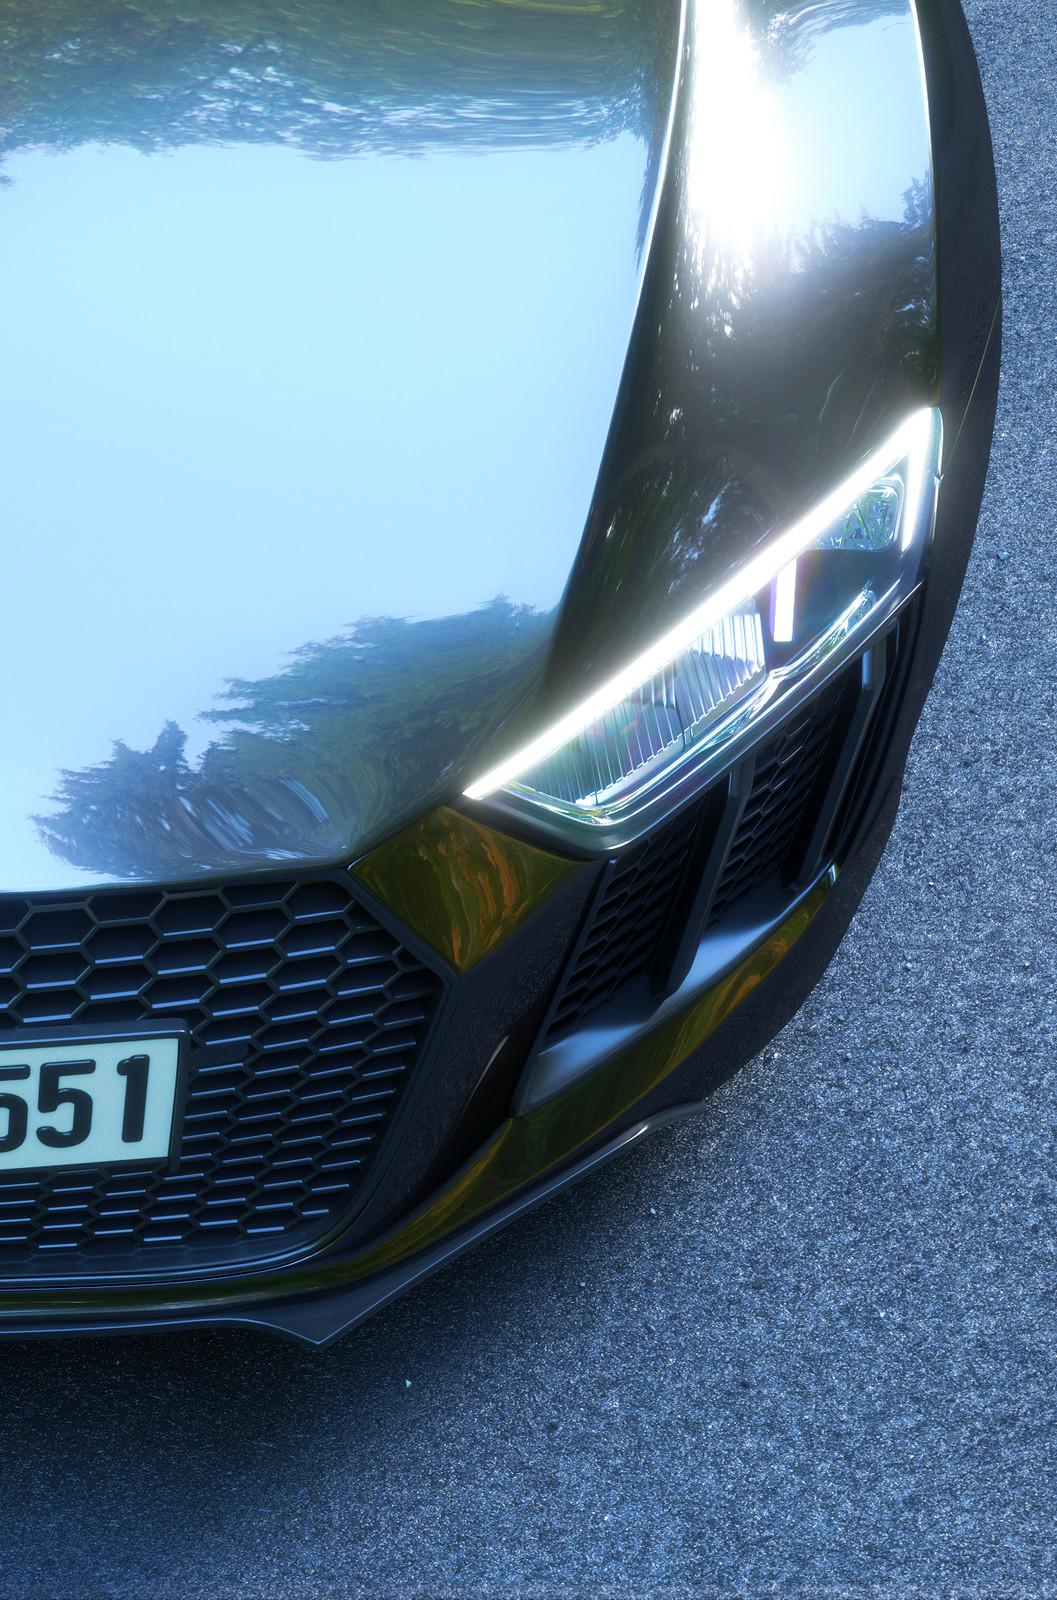 AUDI R8 V10 plus - Full CGI